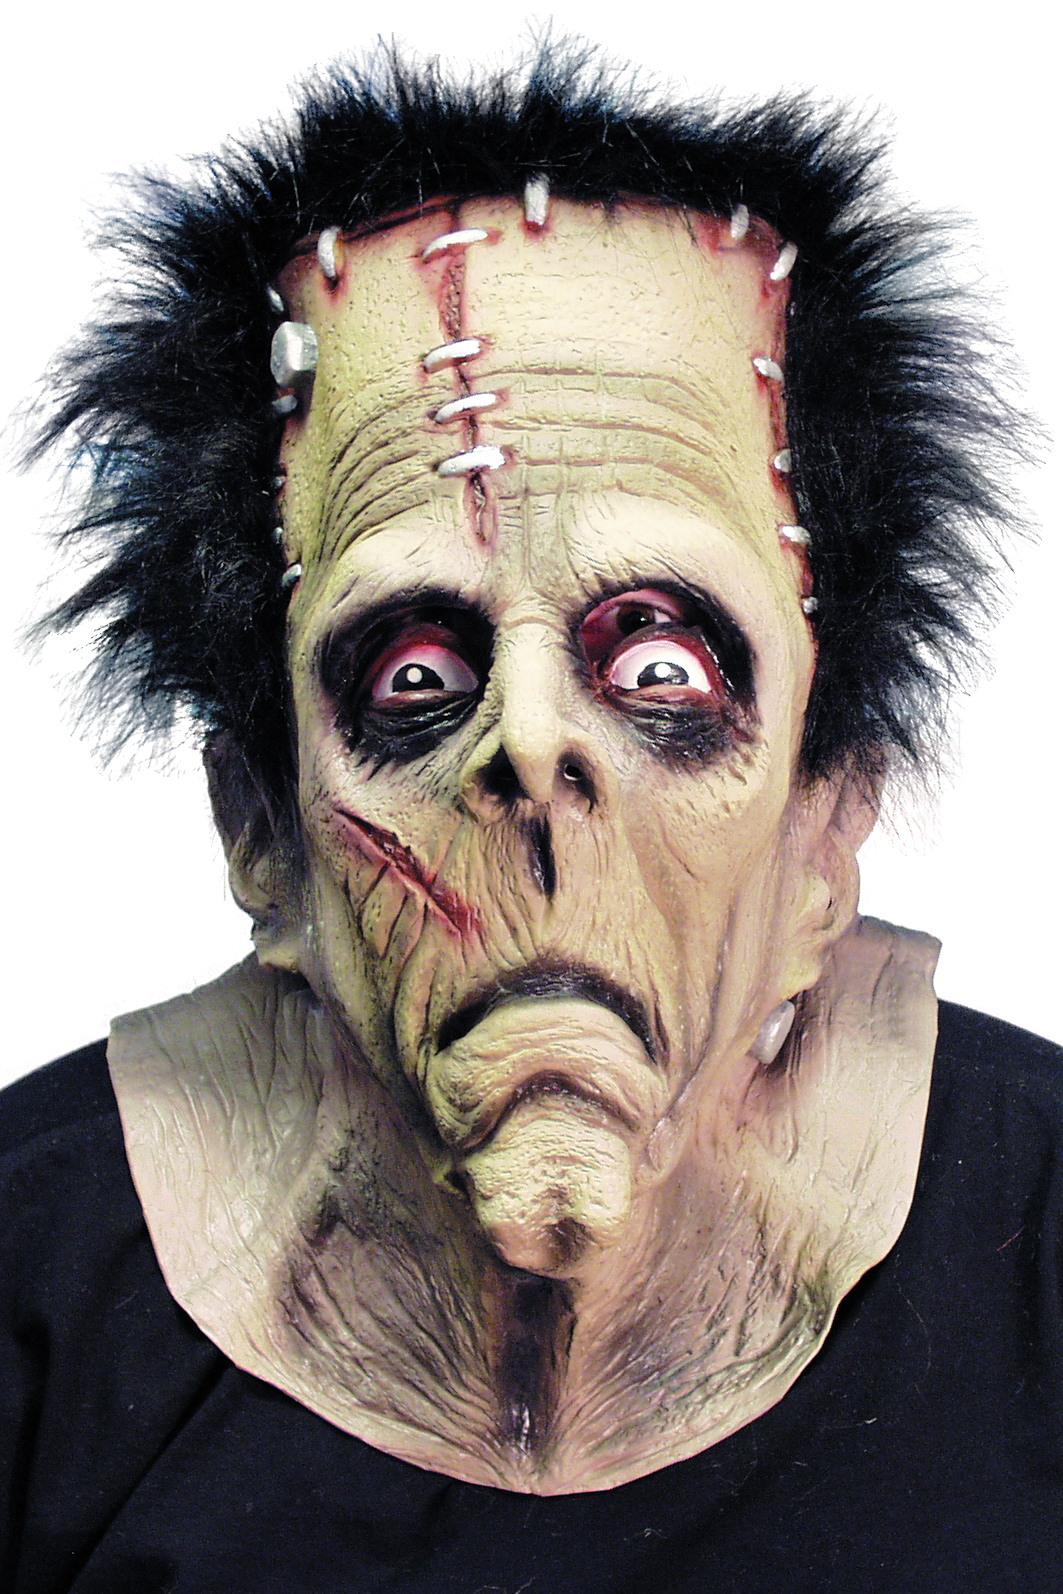 Masque latex de frankenstein adulte halloween - Masque halloween qui fait peur ...